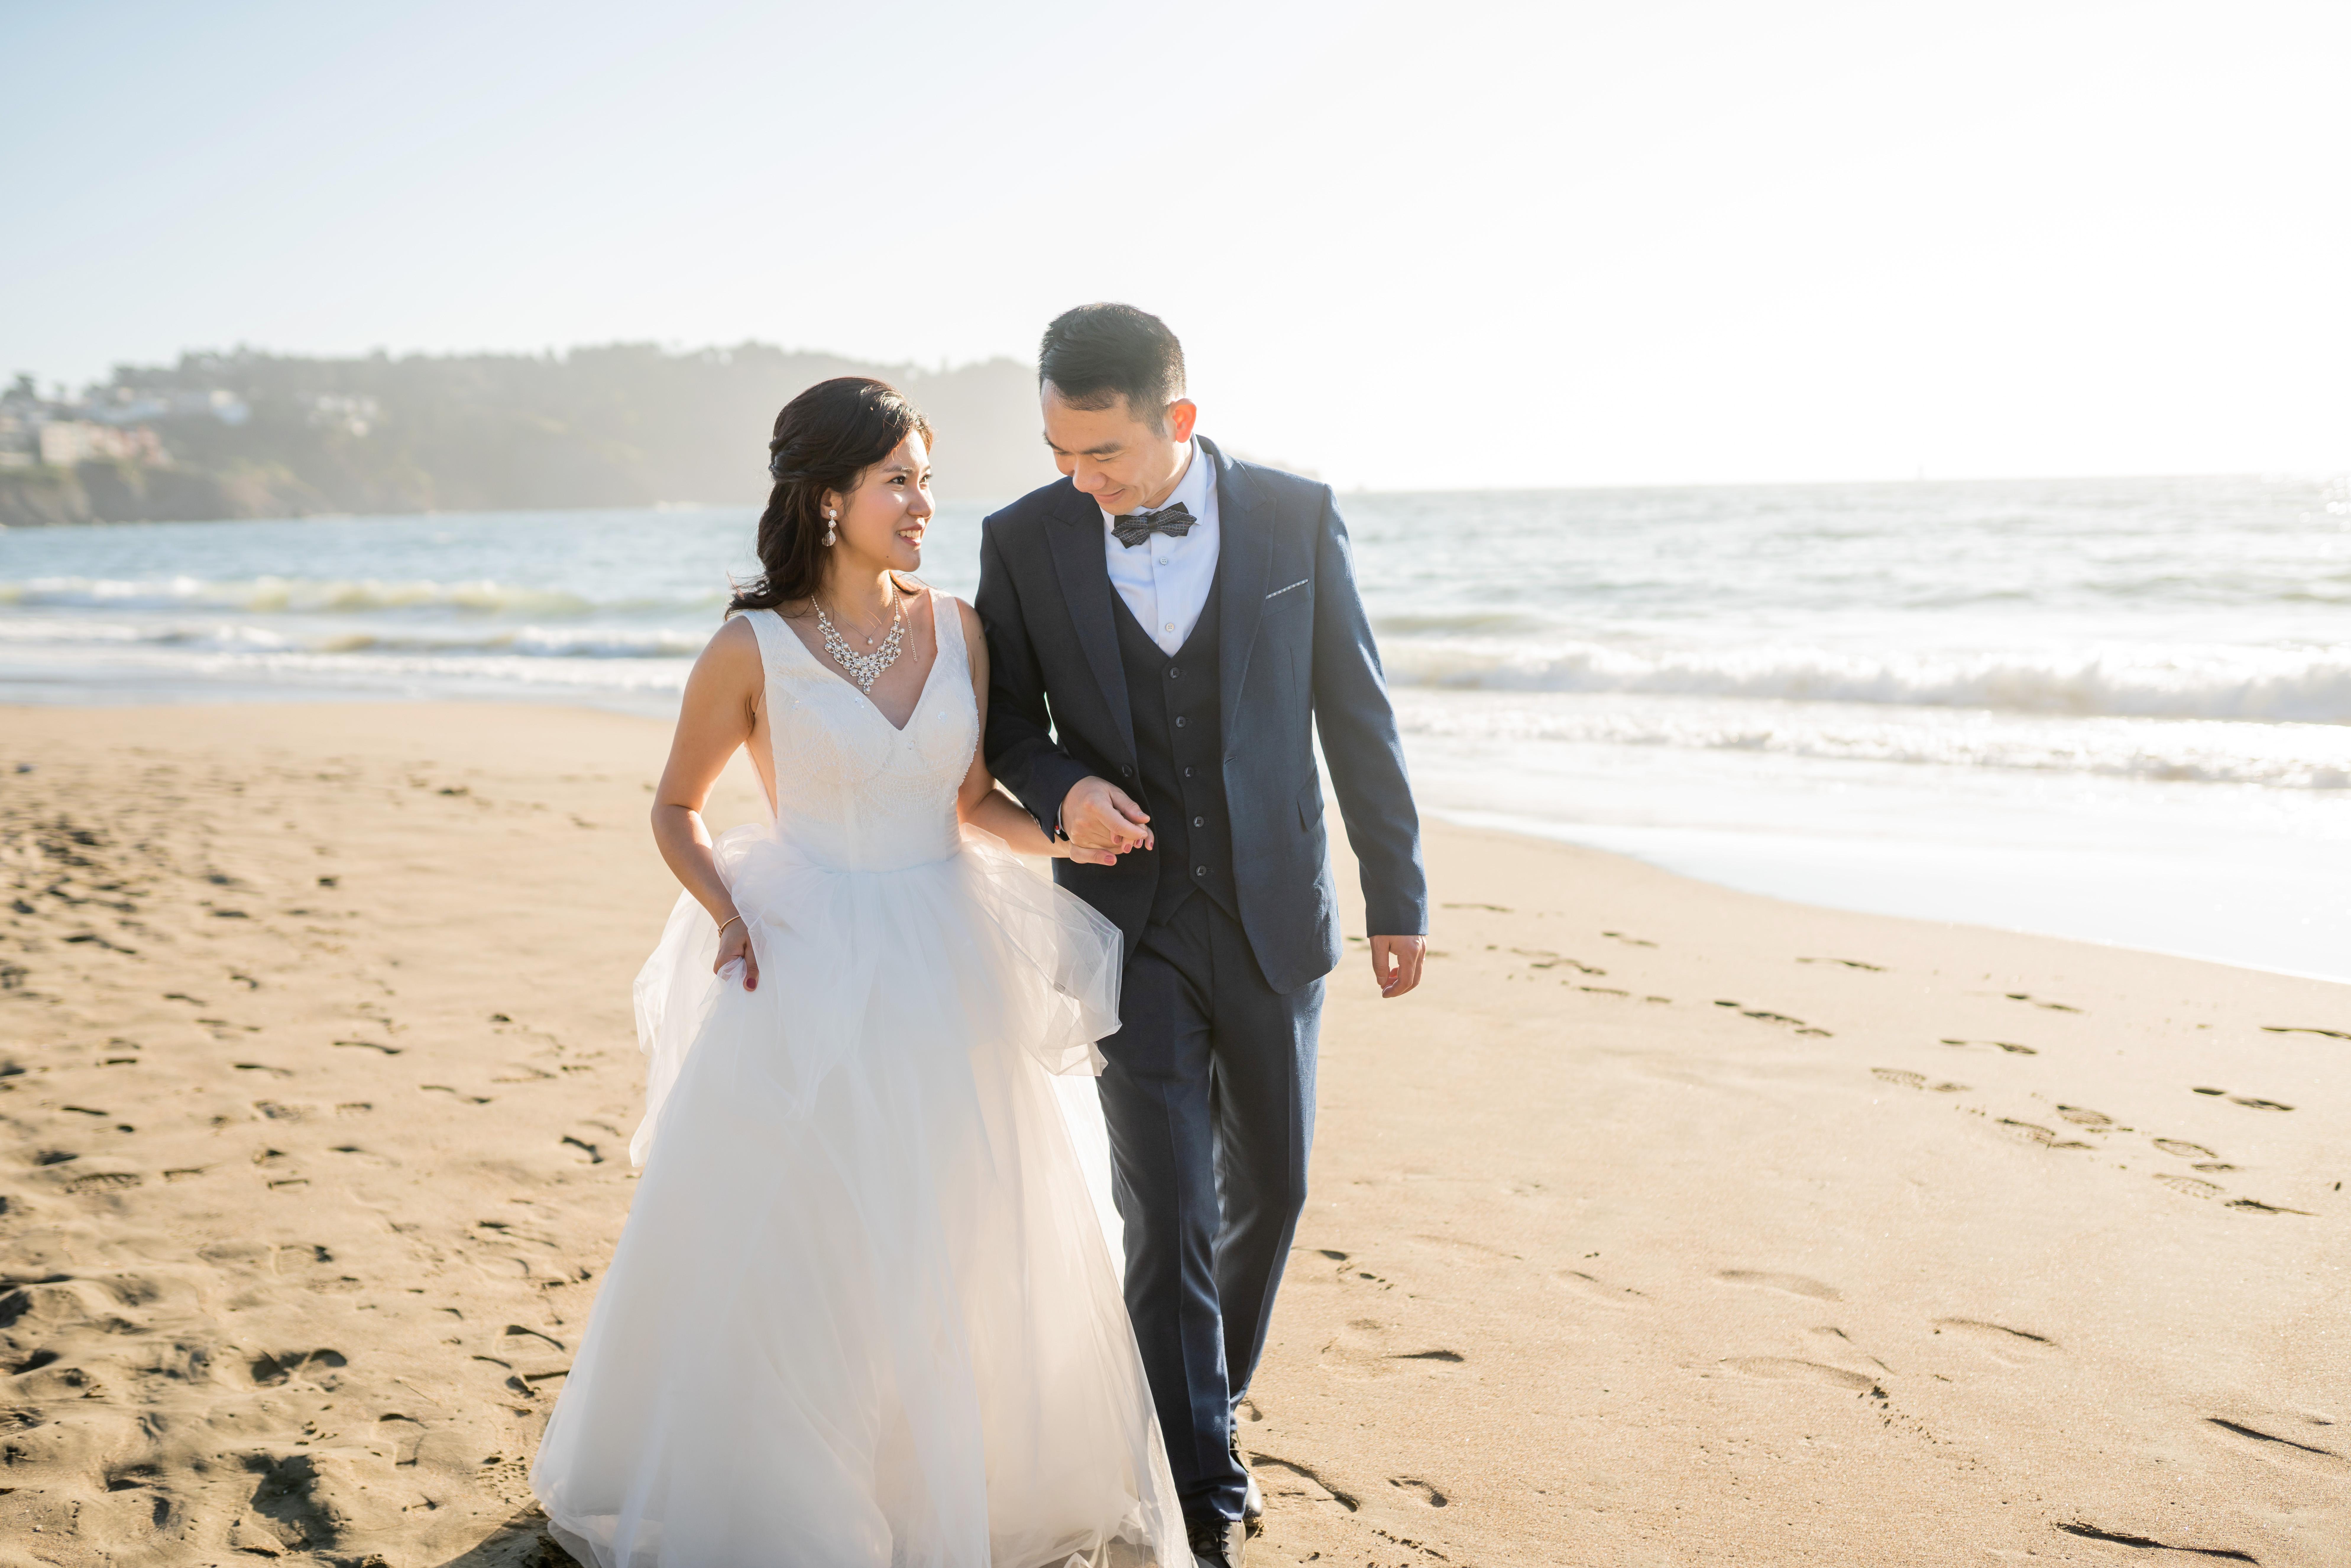 Baker Beach Wedding Photography